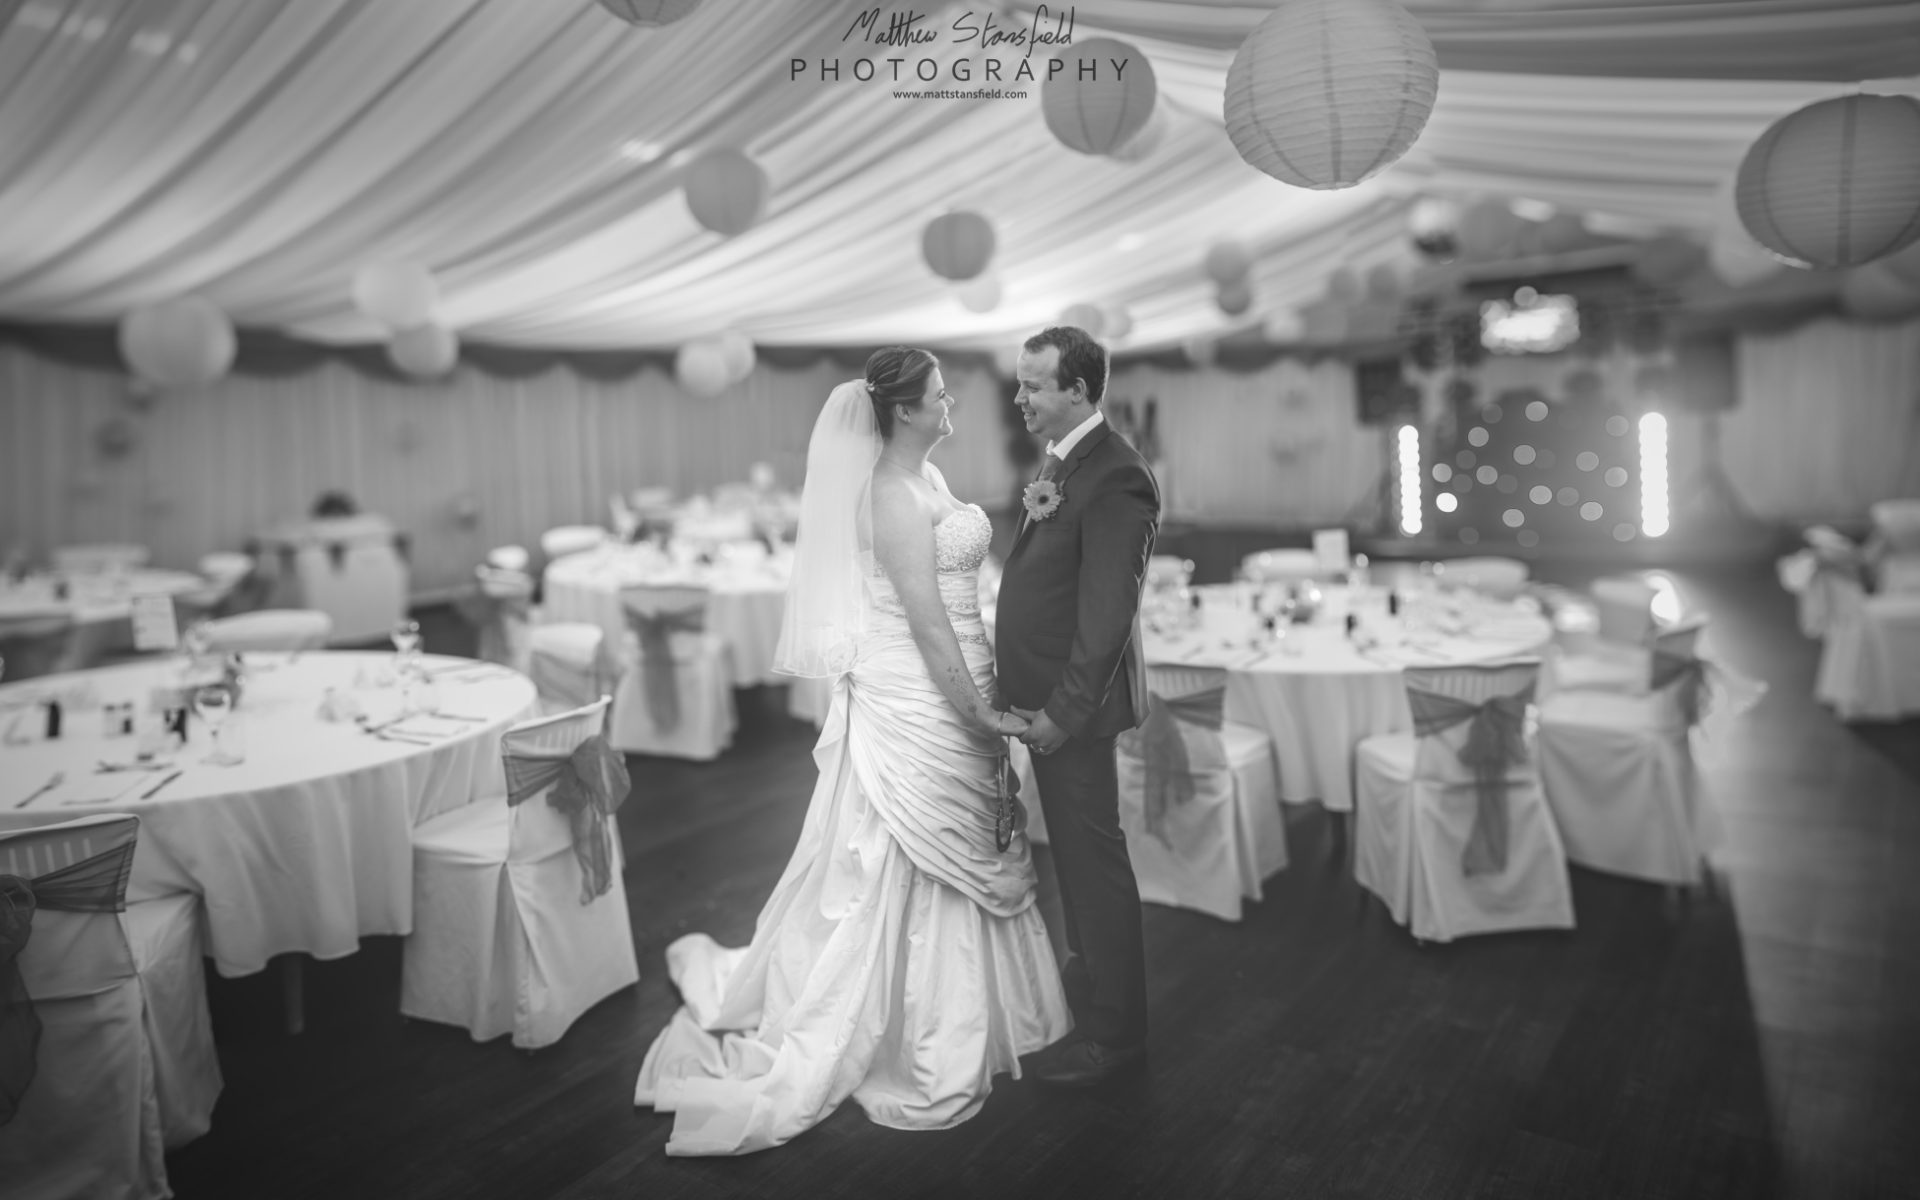 Mark & Jordan Cornwall Wedding Photography at The Carnmarth Hotel